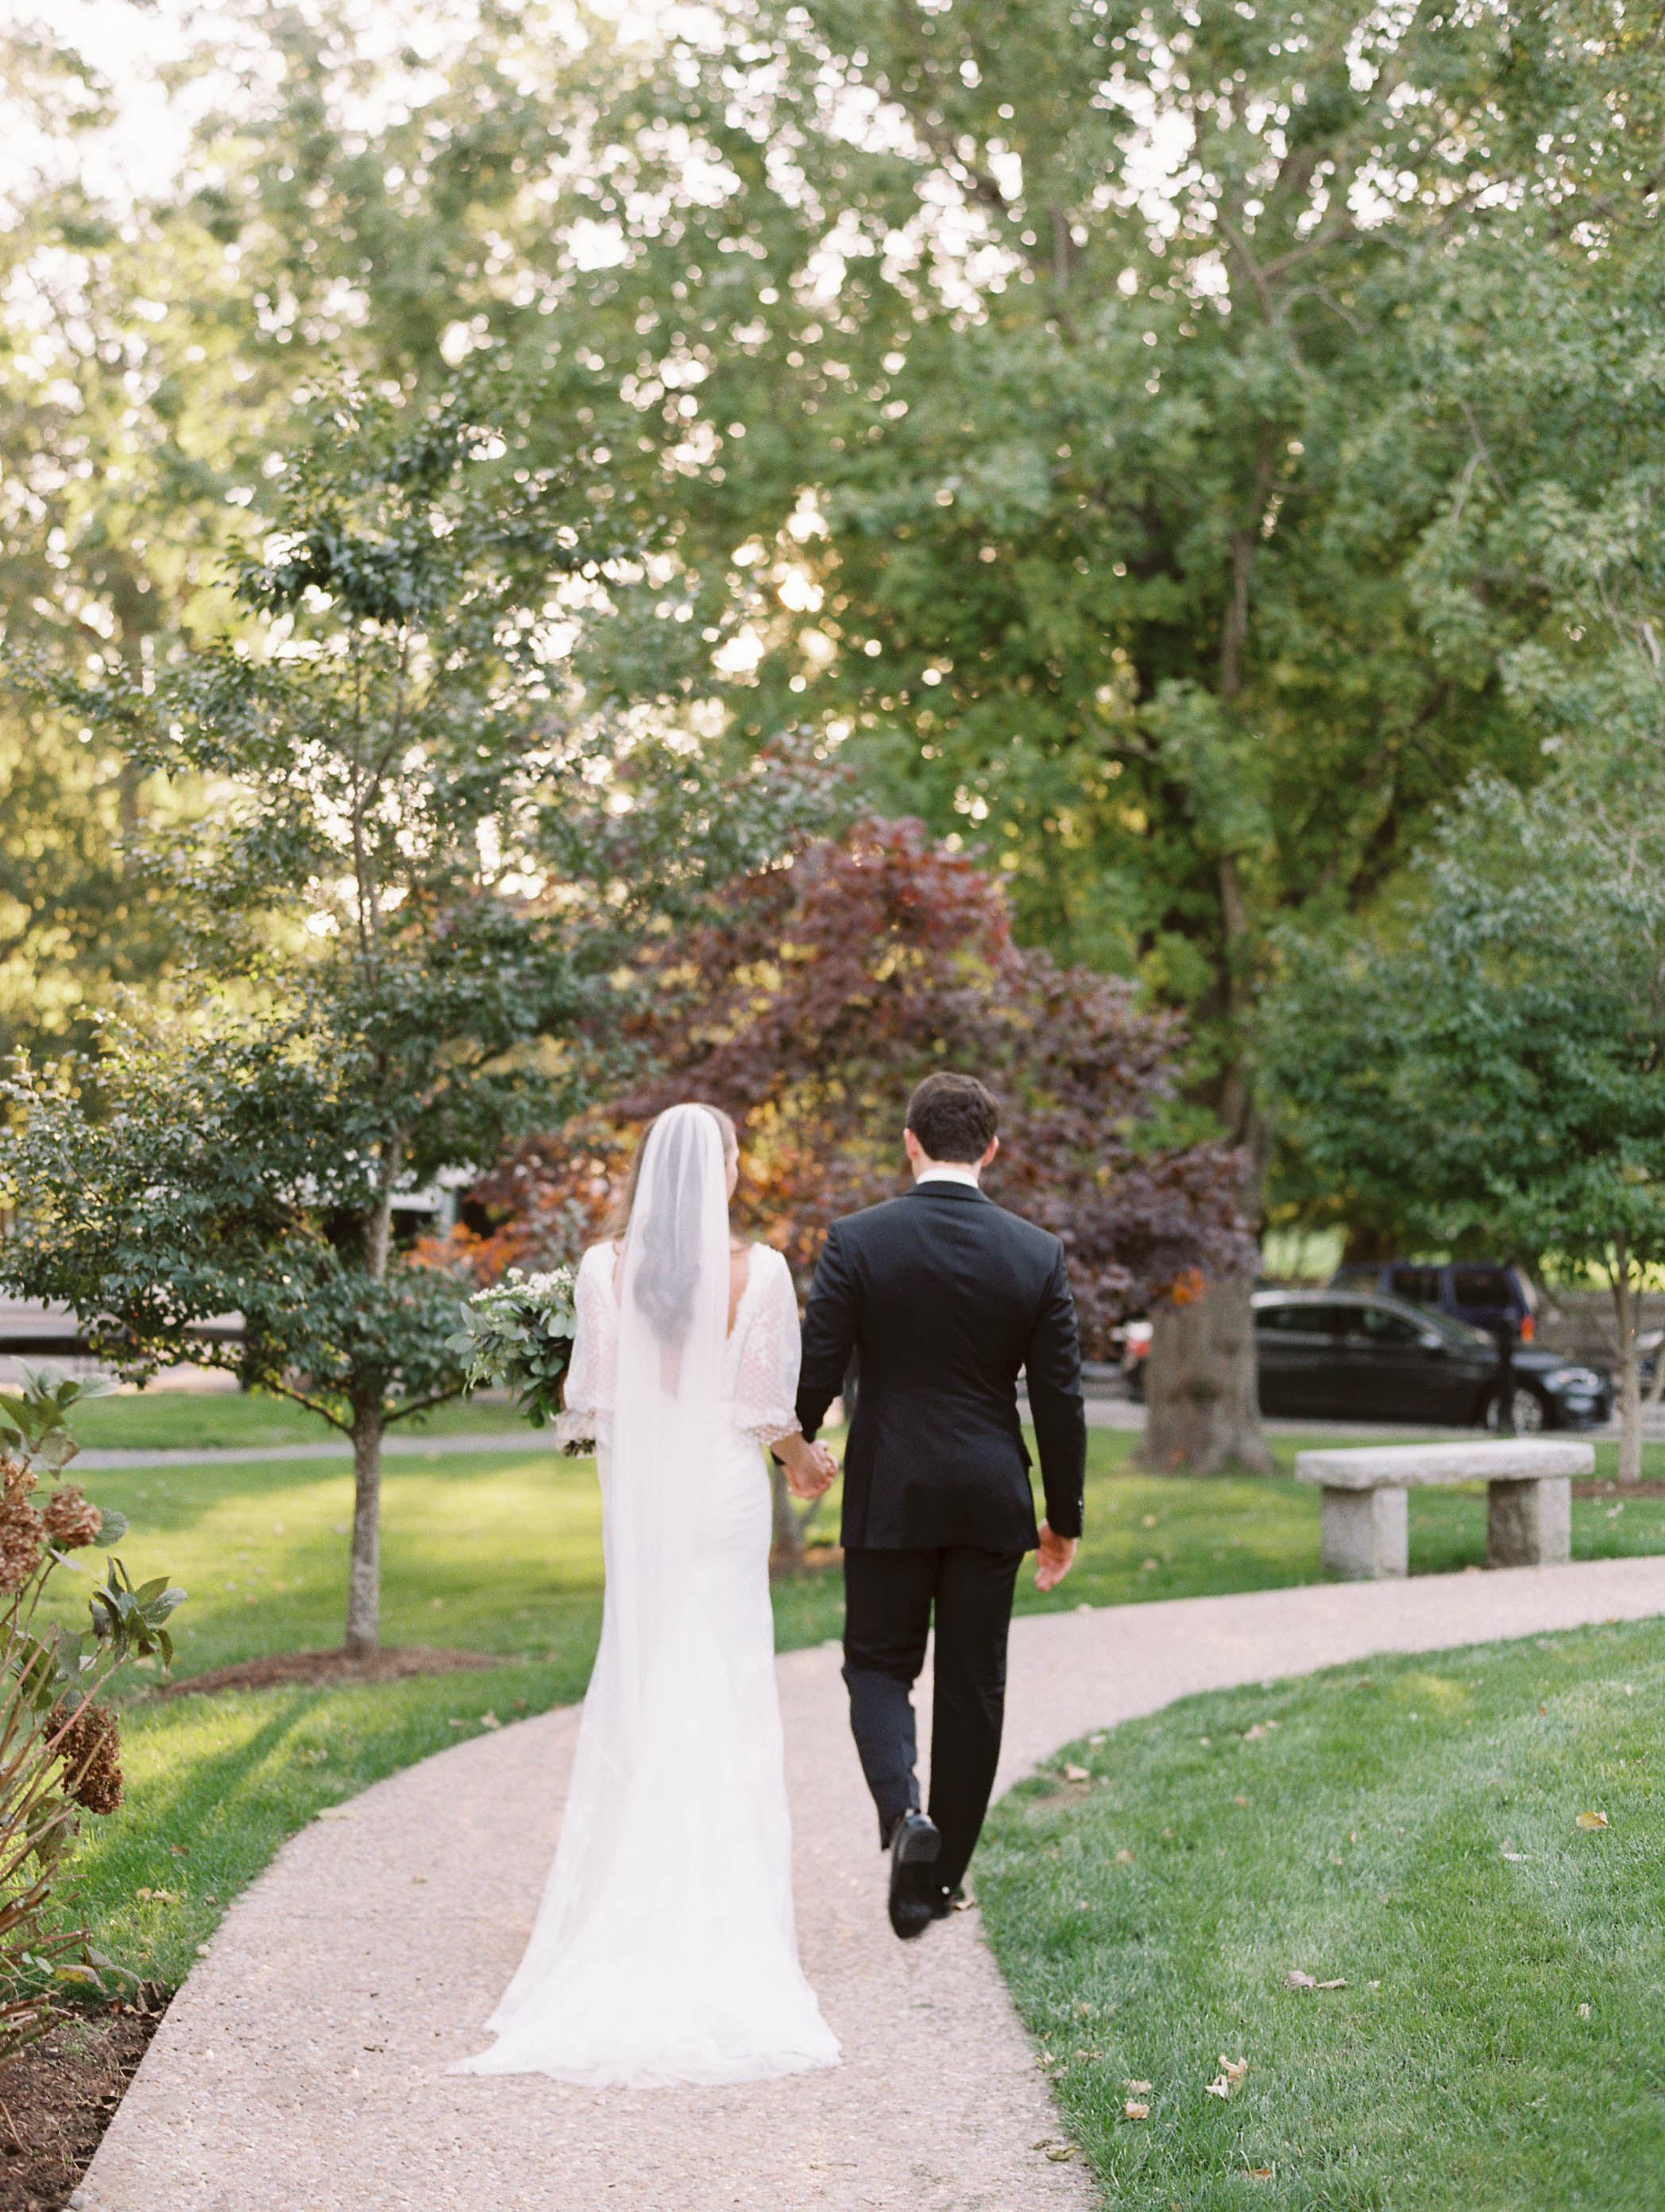 kelsandmichael_weddingphotography_rhodeislandwedding-43.jpg